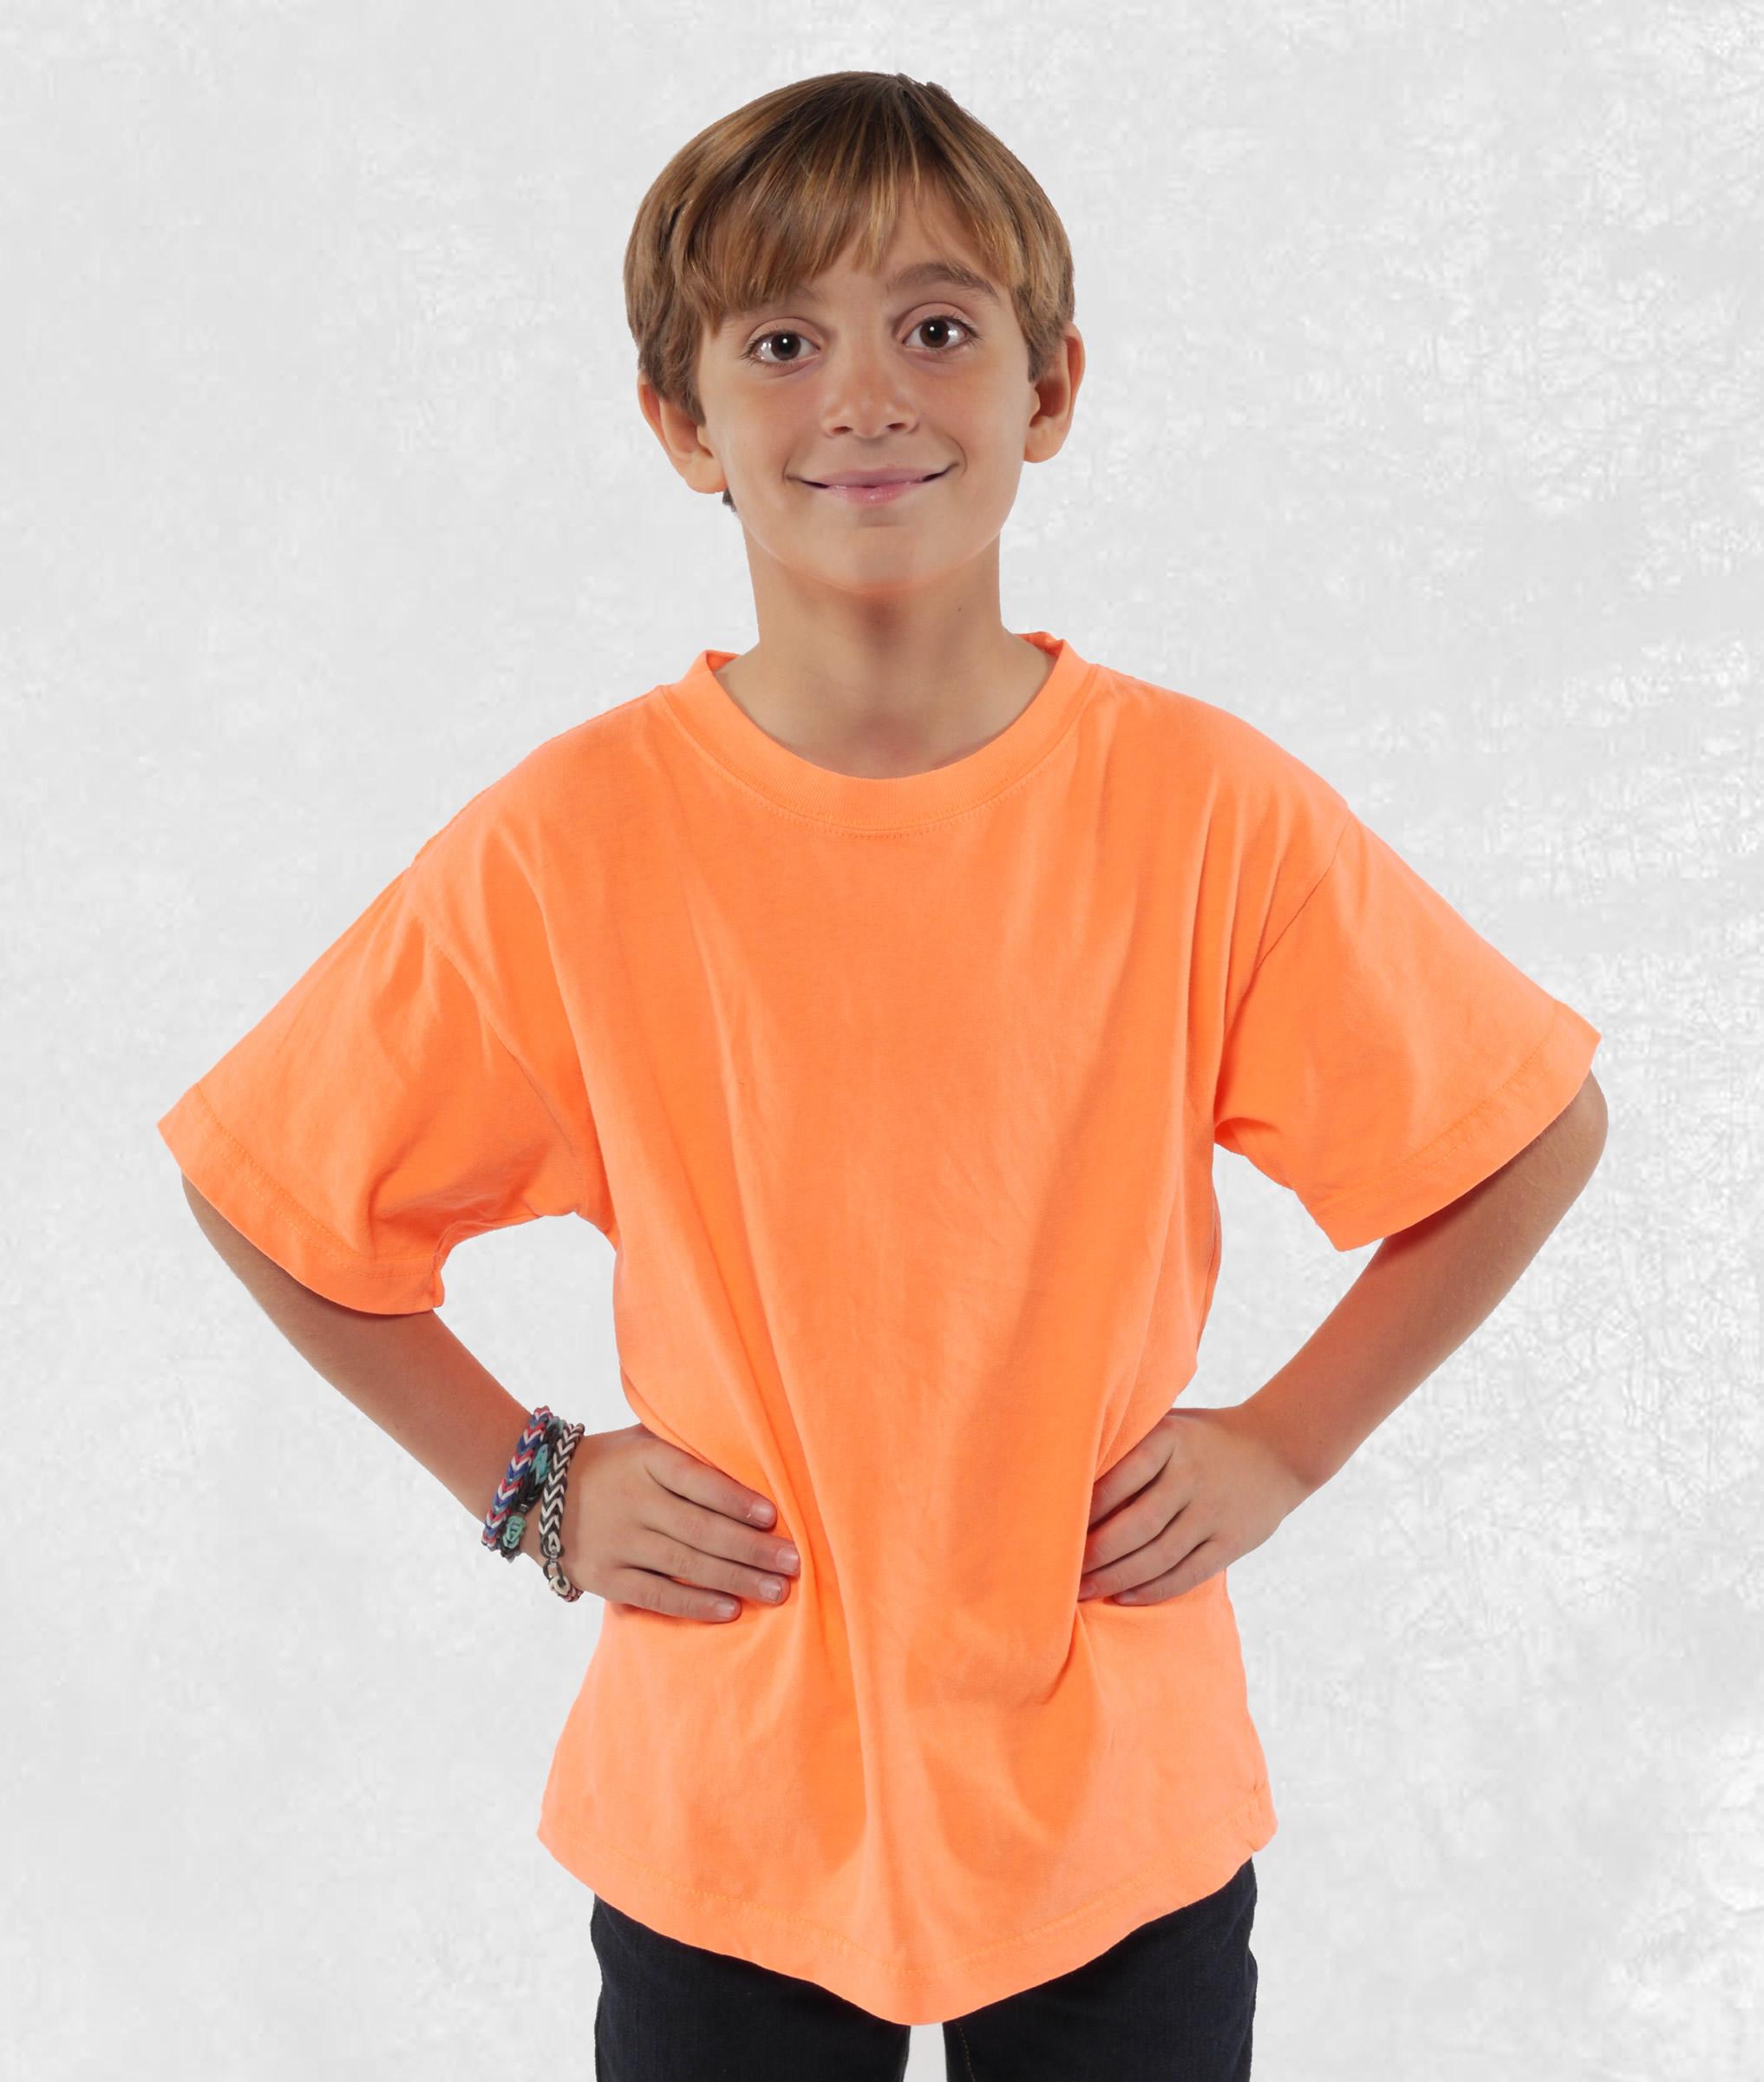 Neon Orange Youth Short Sleeve Tees